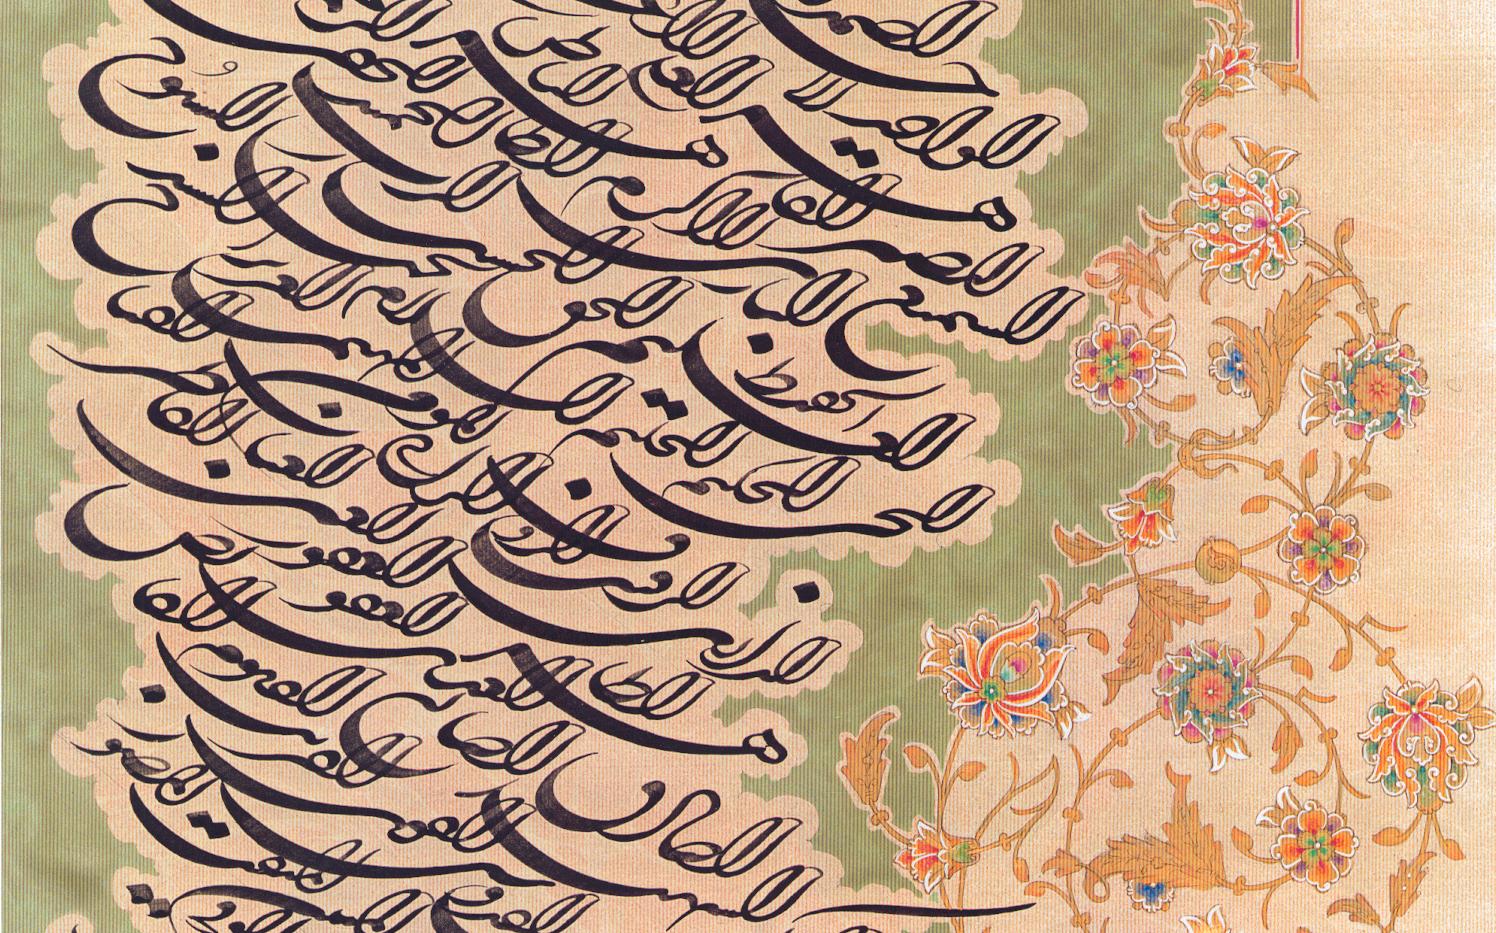 Ali Rezvani Ink on paper & illumination 47 x 31 cm